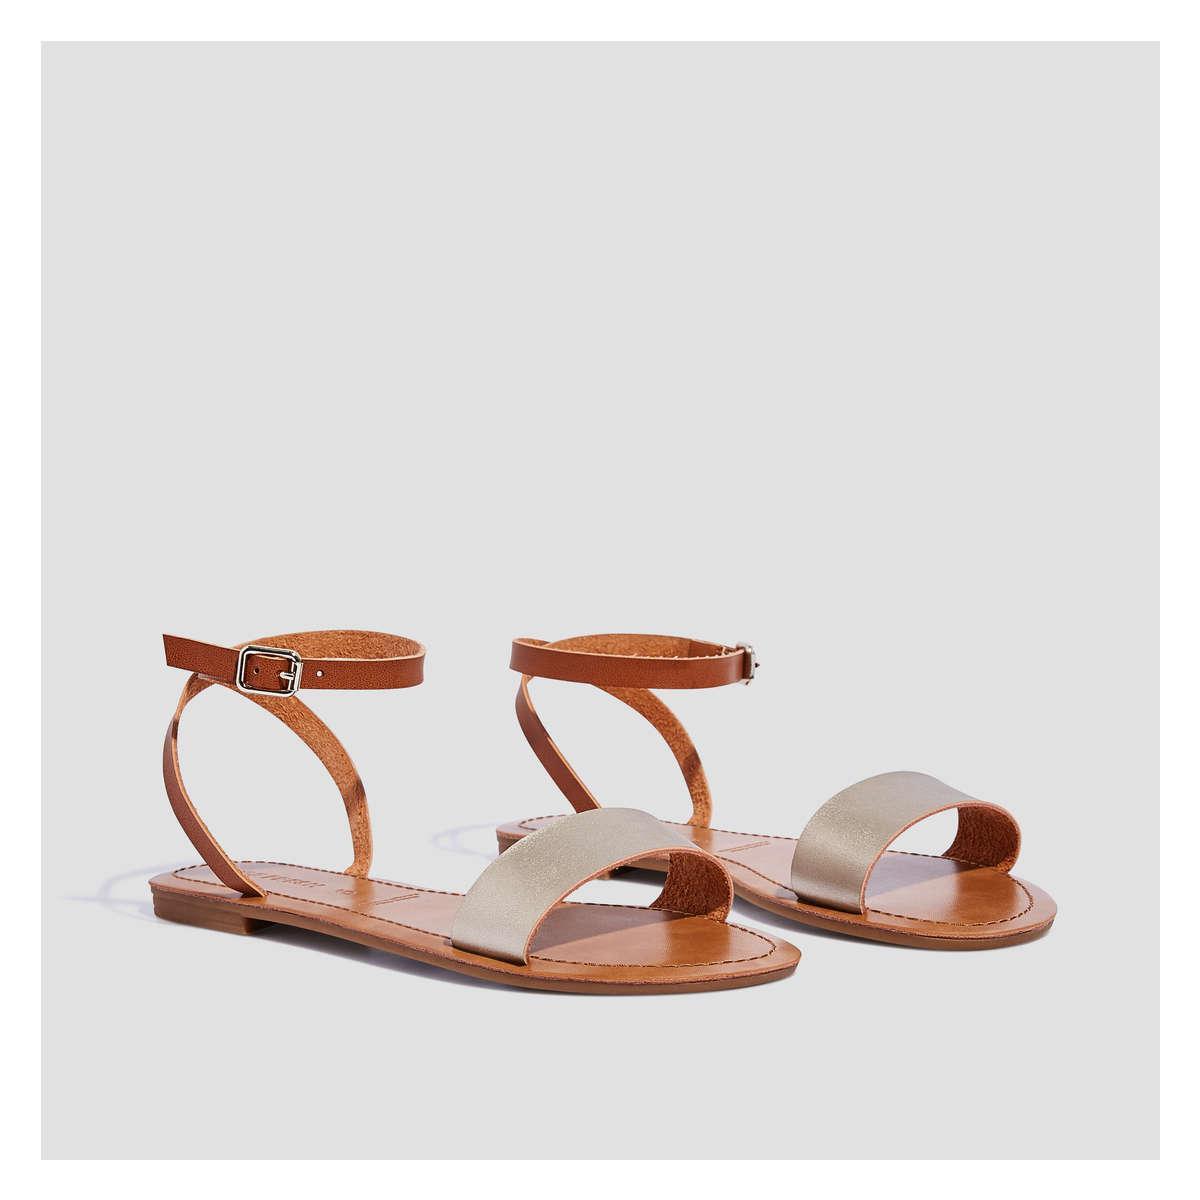 048bcb0e346 Lyst - Joe Fresh Metallic Sandal in Metallic